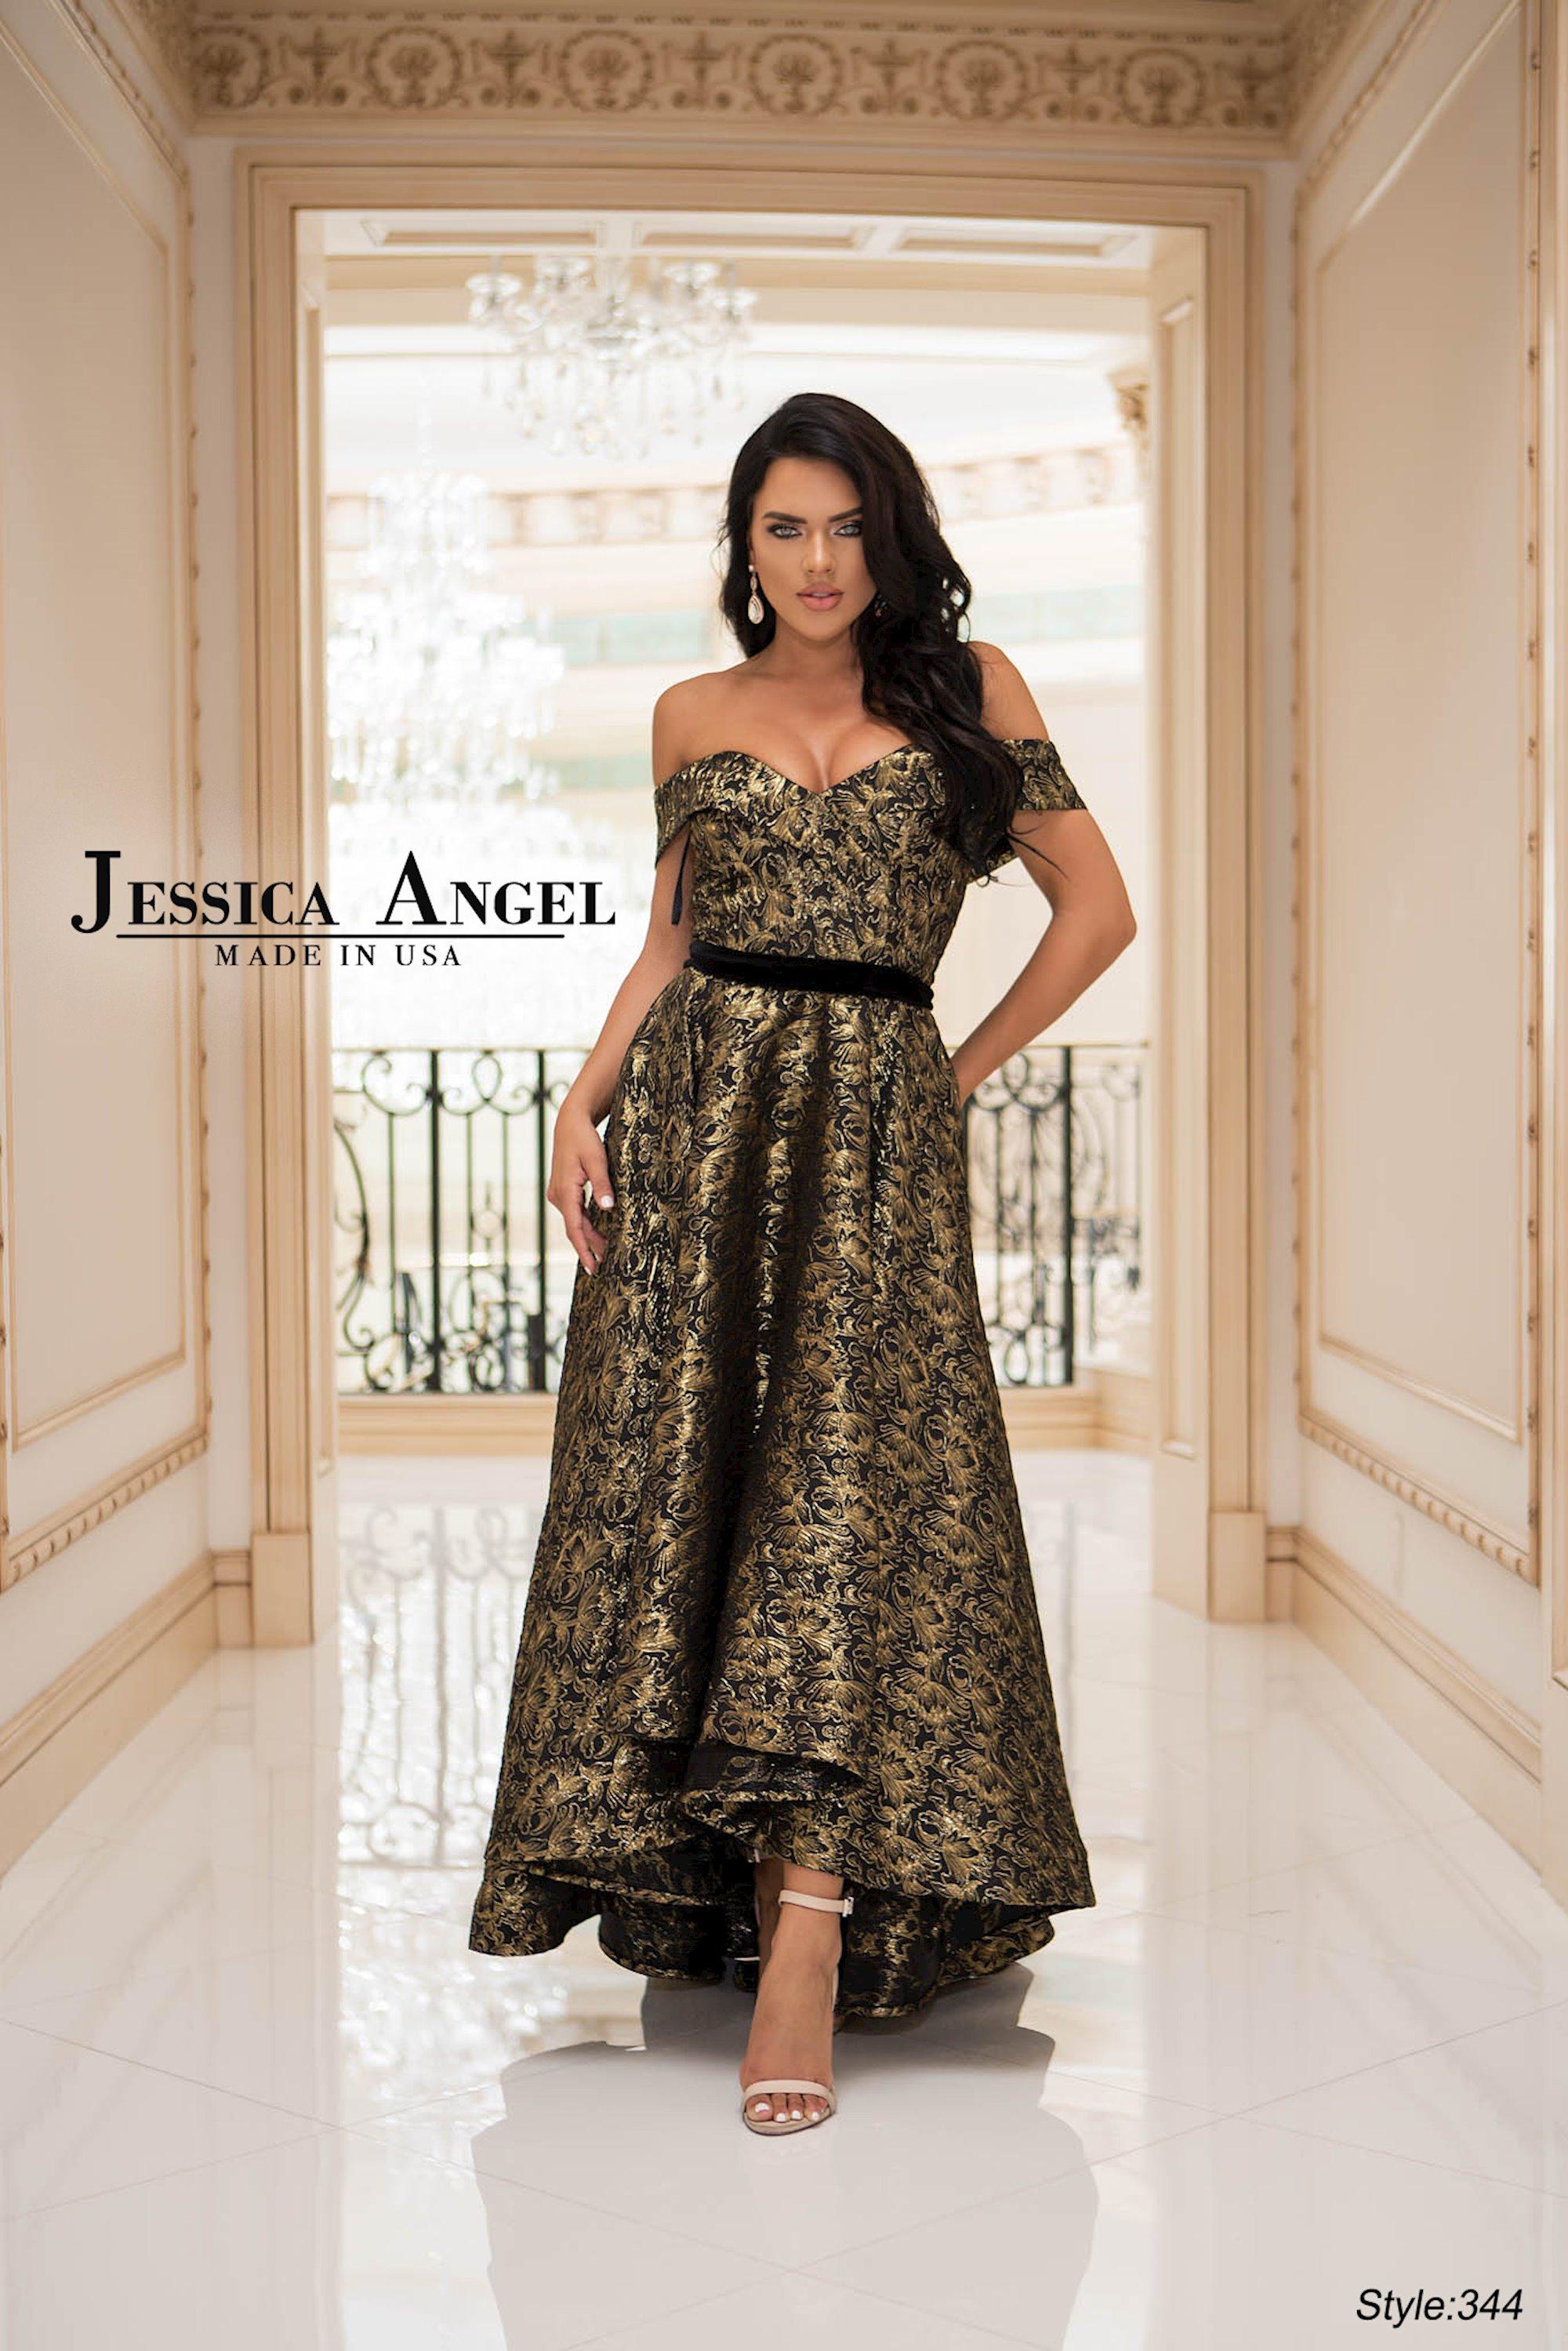 fa81d347c5 Jessica Angel - 344